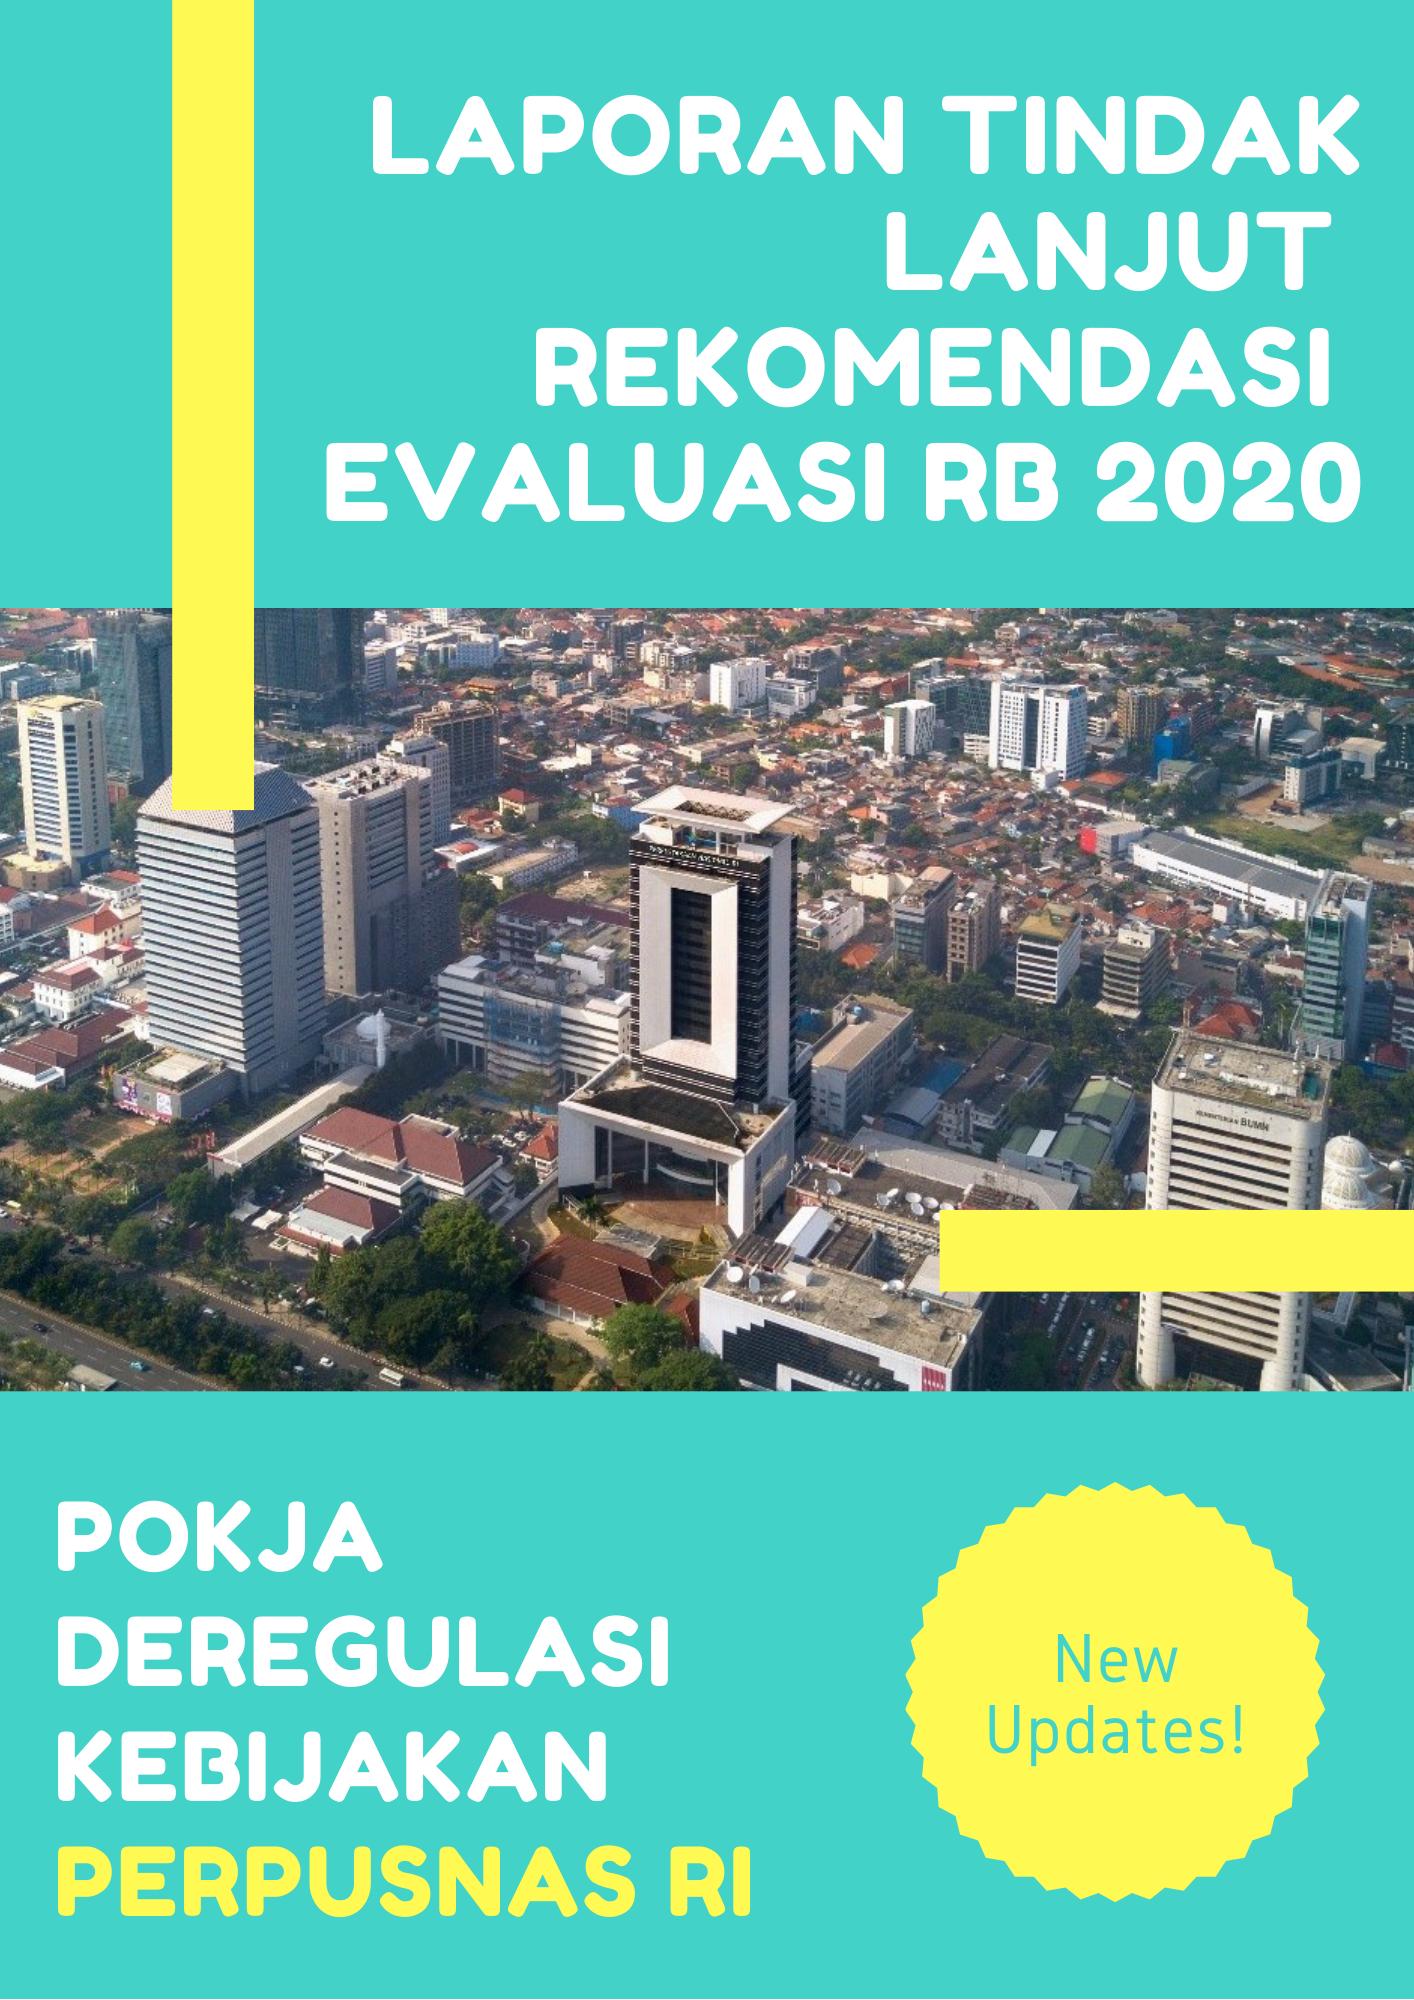 LAPORAN TINDAK LANJUT ATAS REKOMENDASI EXIT MEETING EVALUASI  RB 2020 - Deregulasi Kebijakan